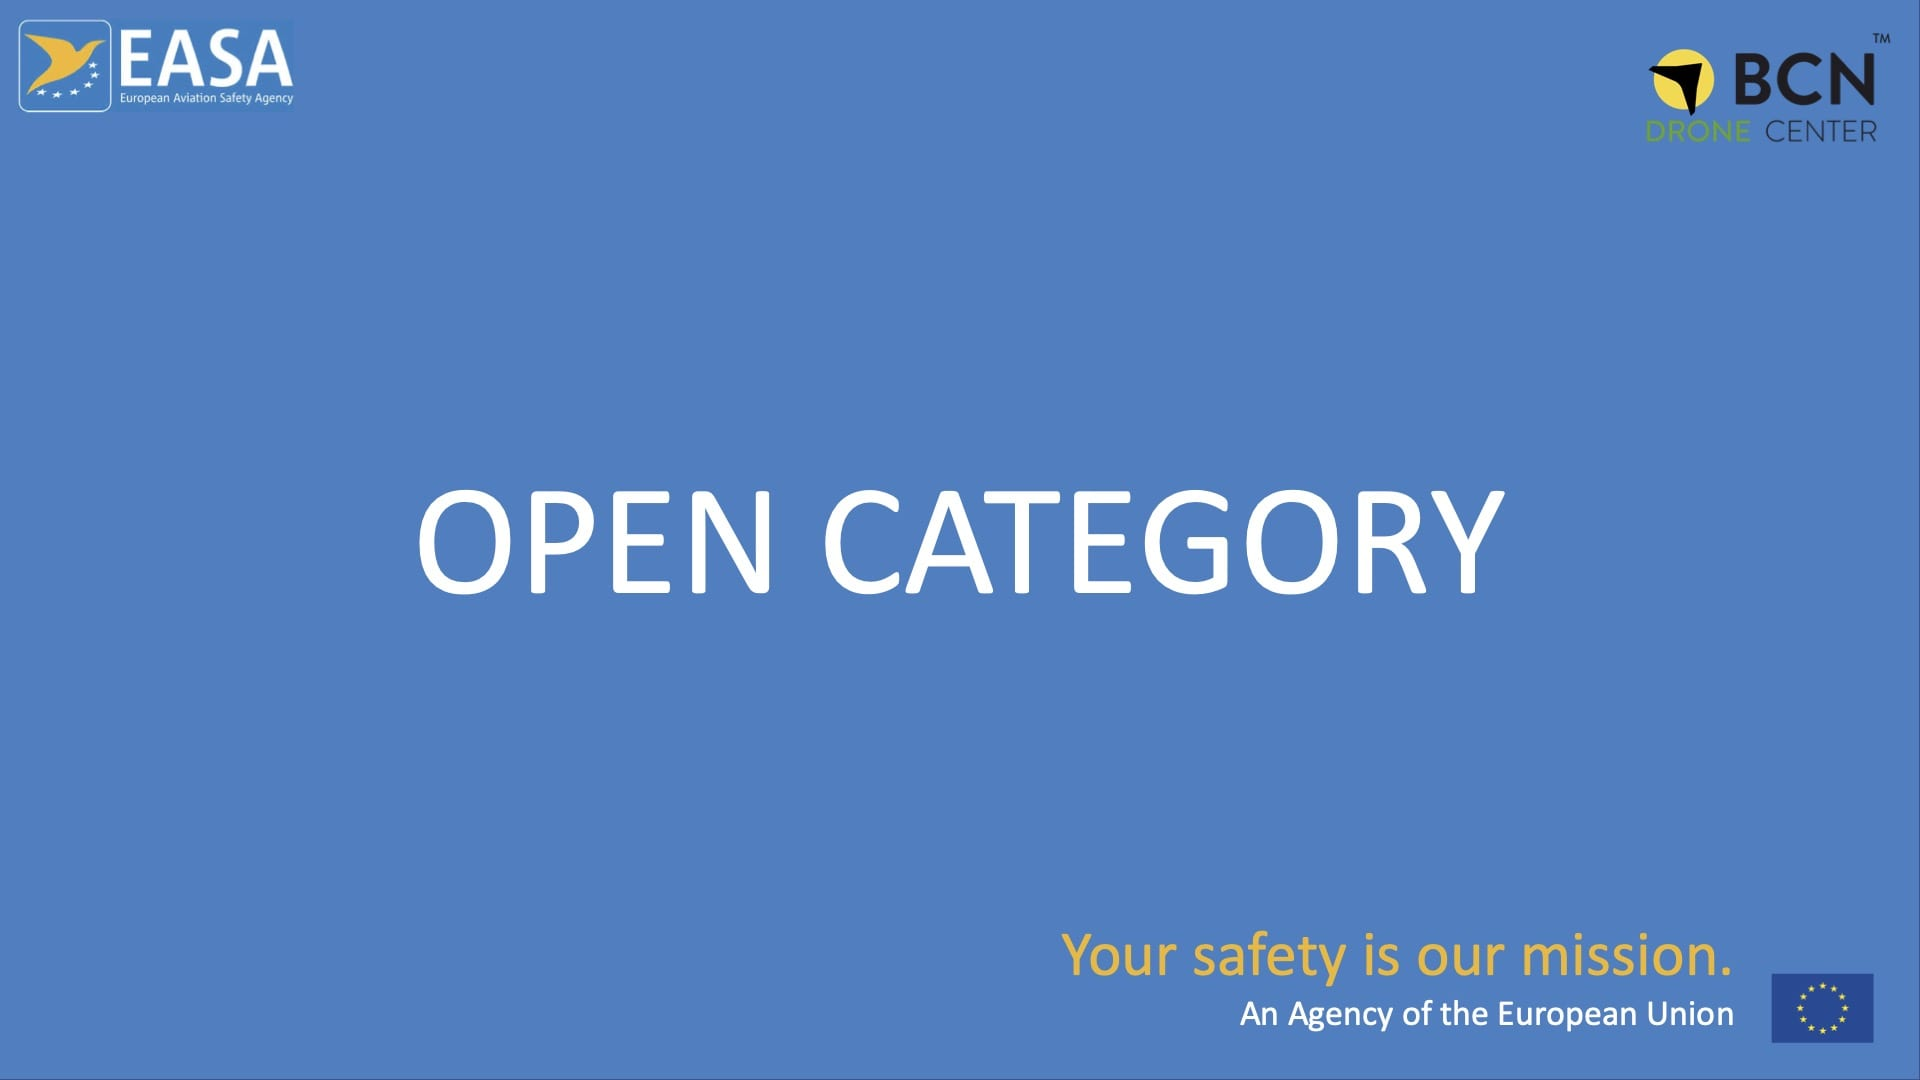 Open Category